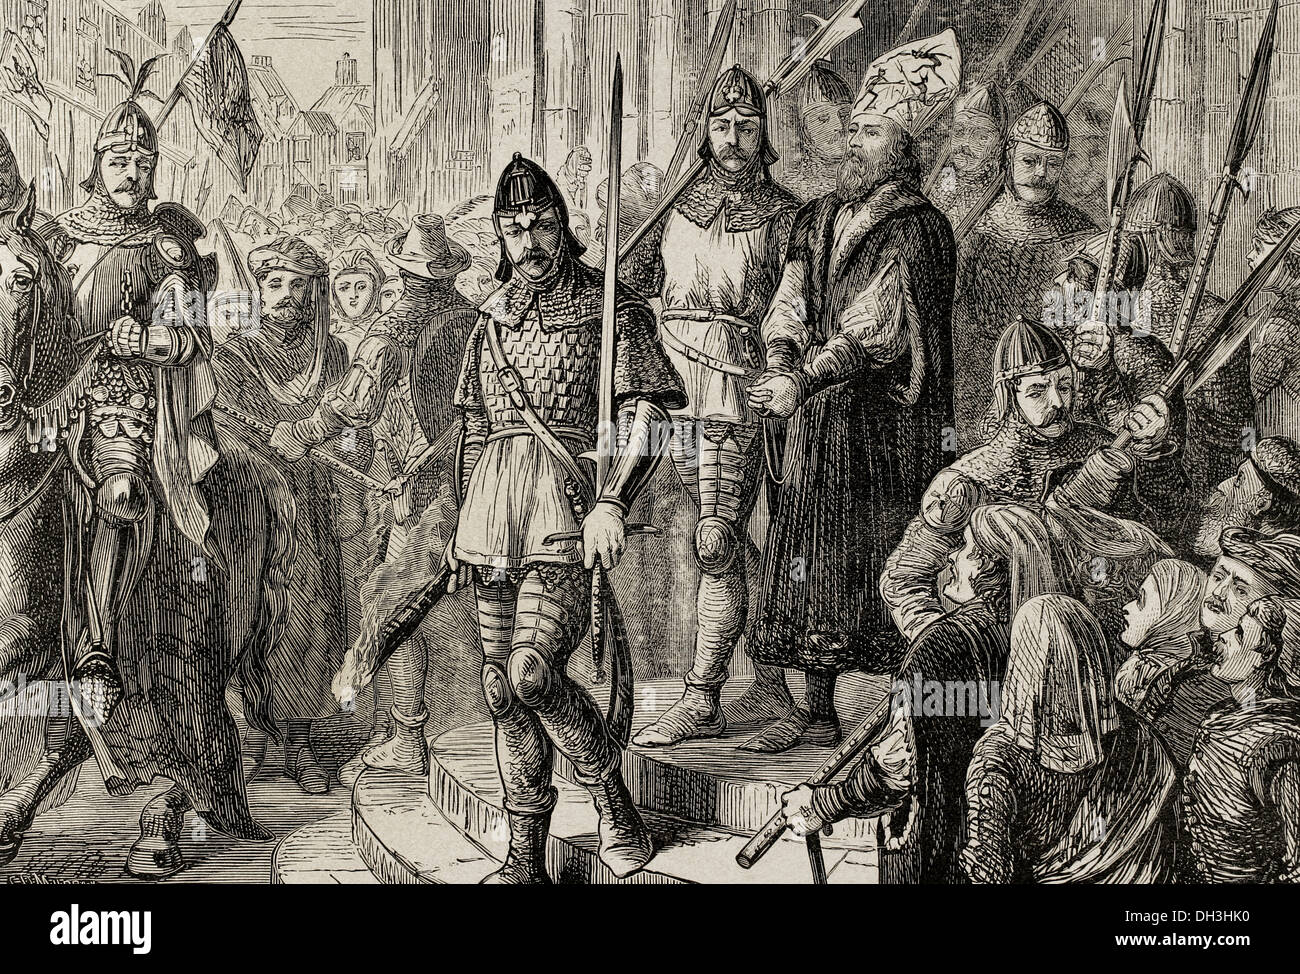 Jerome of Prague (1360-1416). Bohemian preacher. Jerome of Prague marching to execution. Engraving. - Stock Image